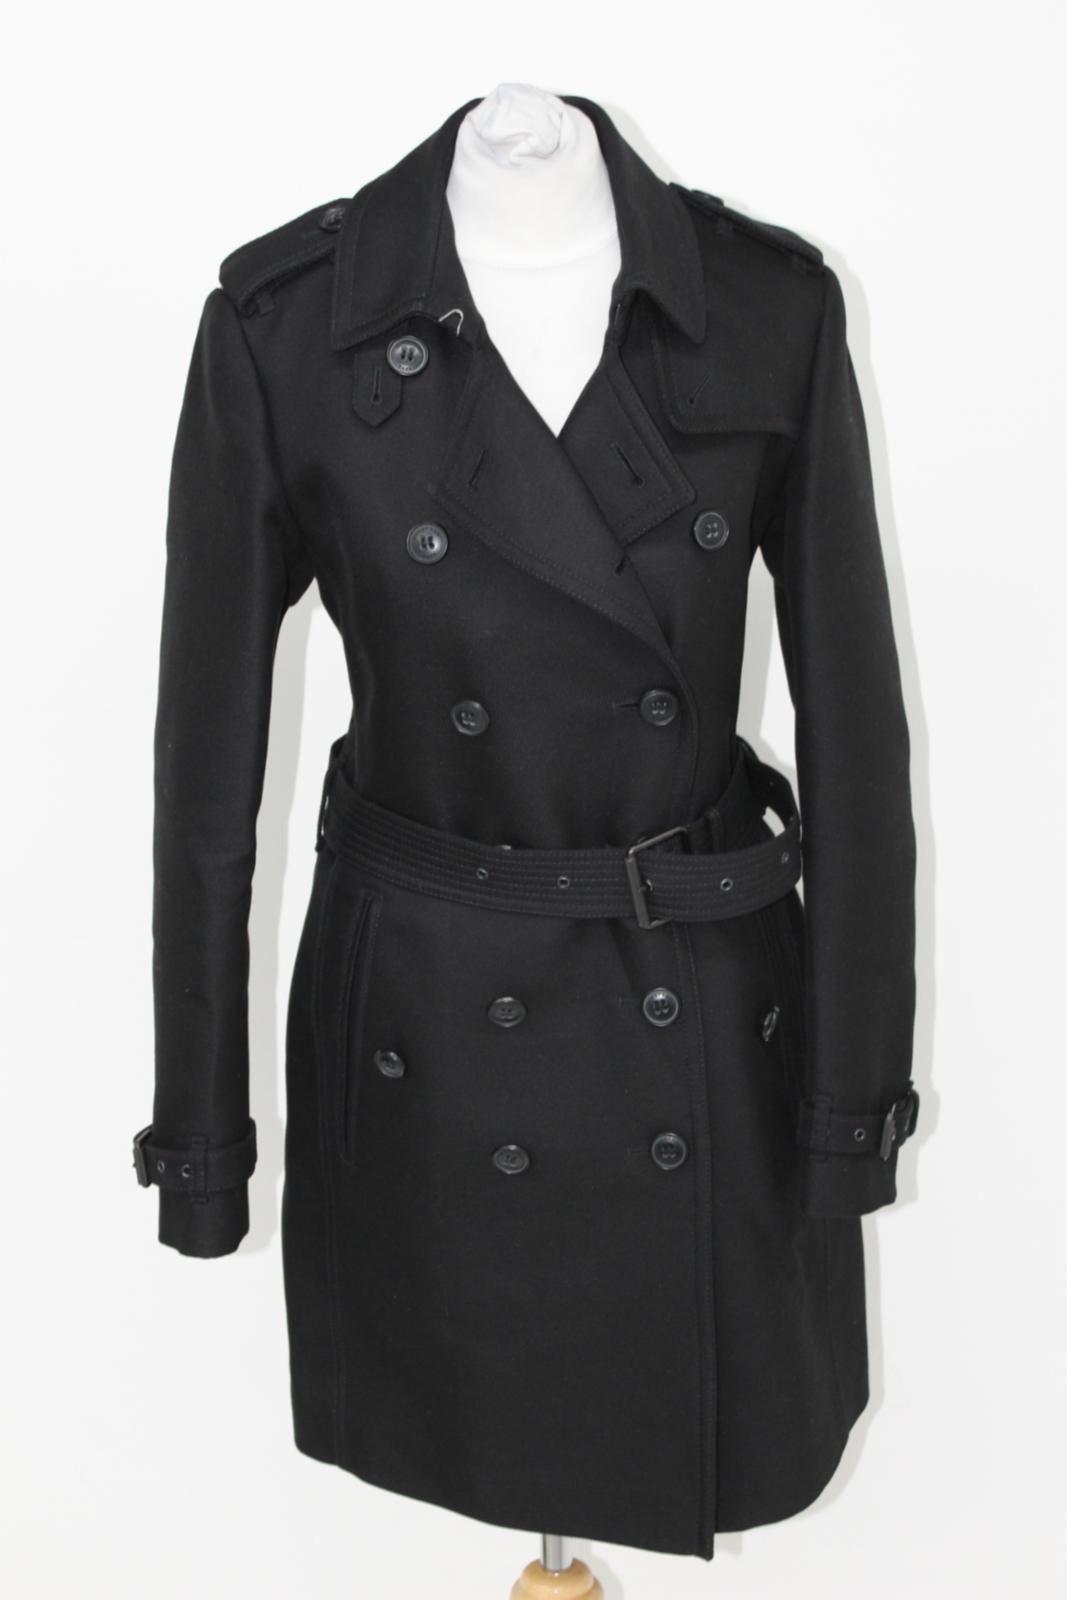 Burberry Brit Langarm Damen schwarz Jacke Doppelte Brust MAC Trenchcoat uk6